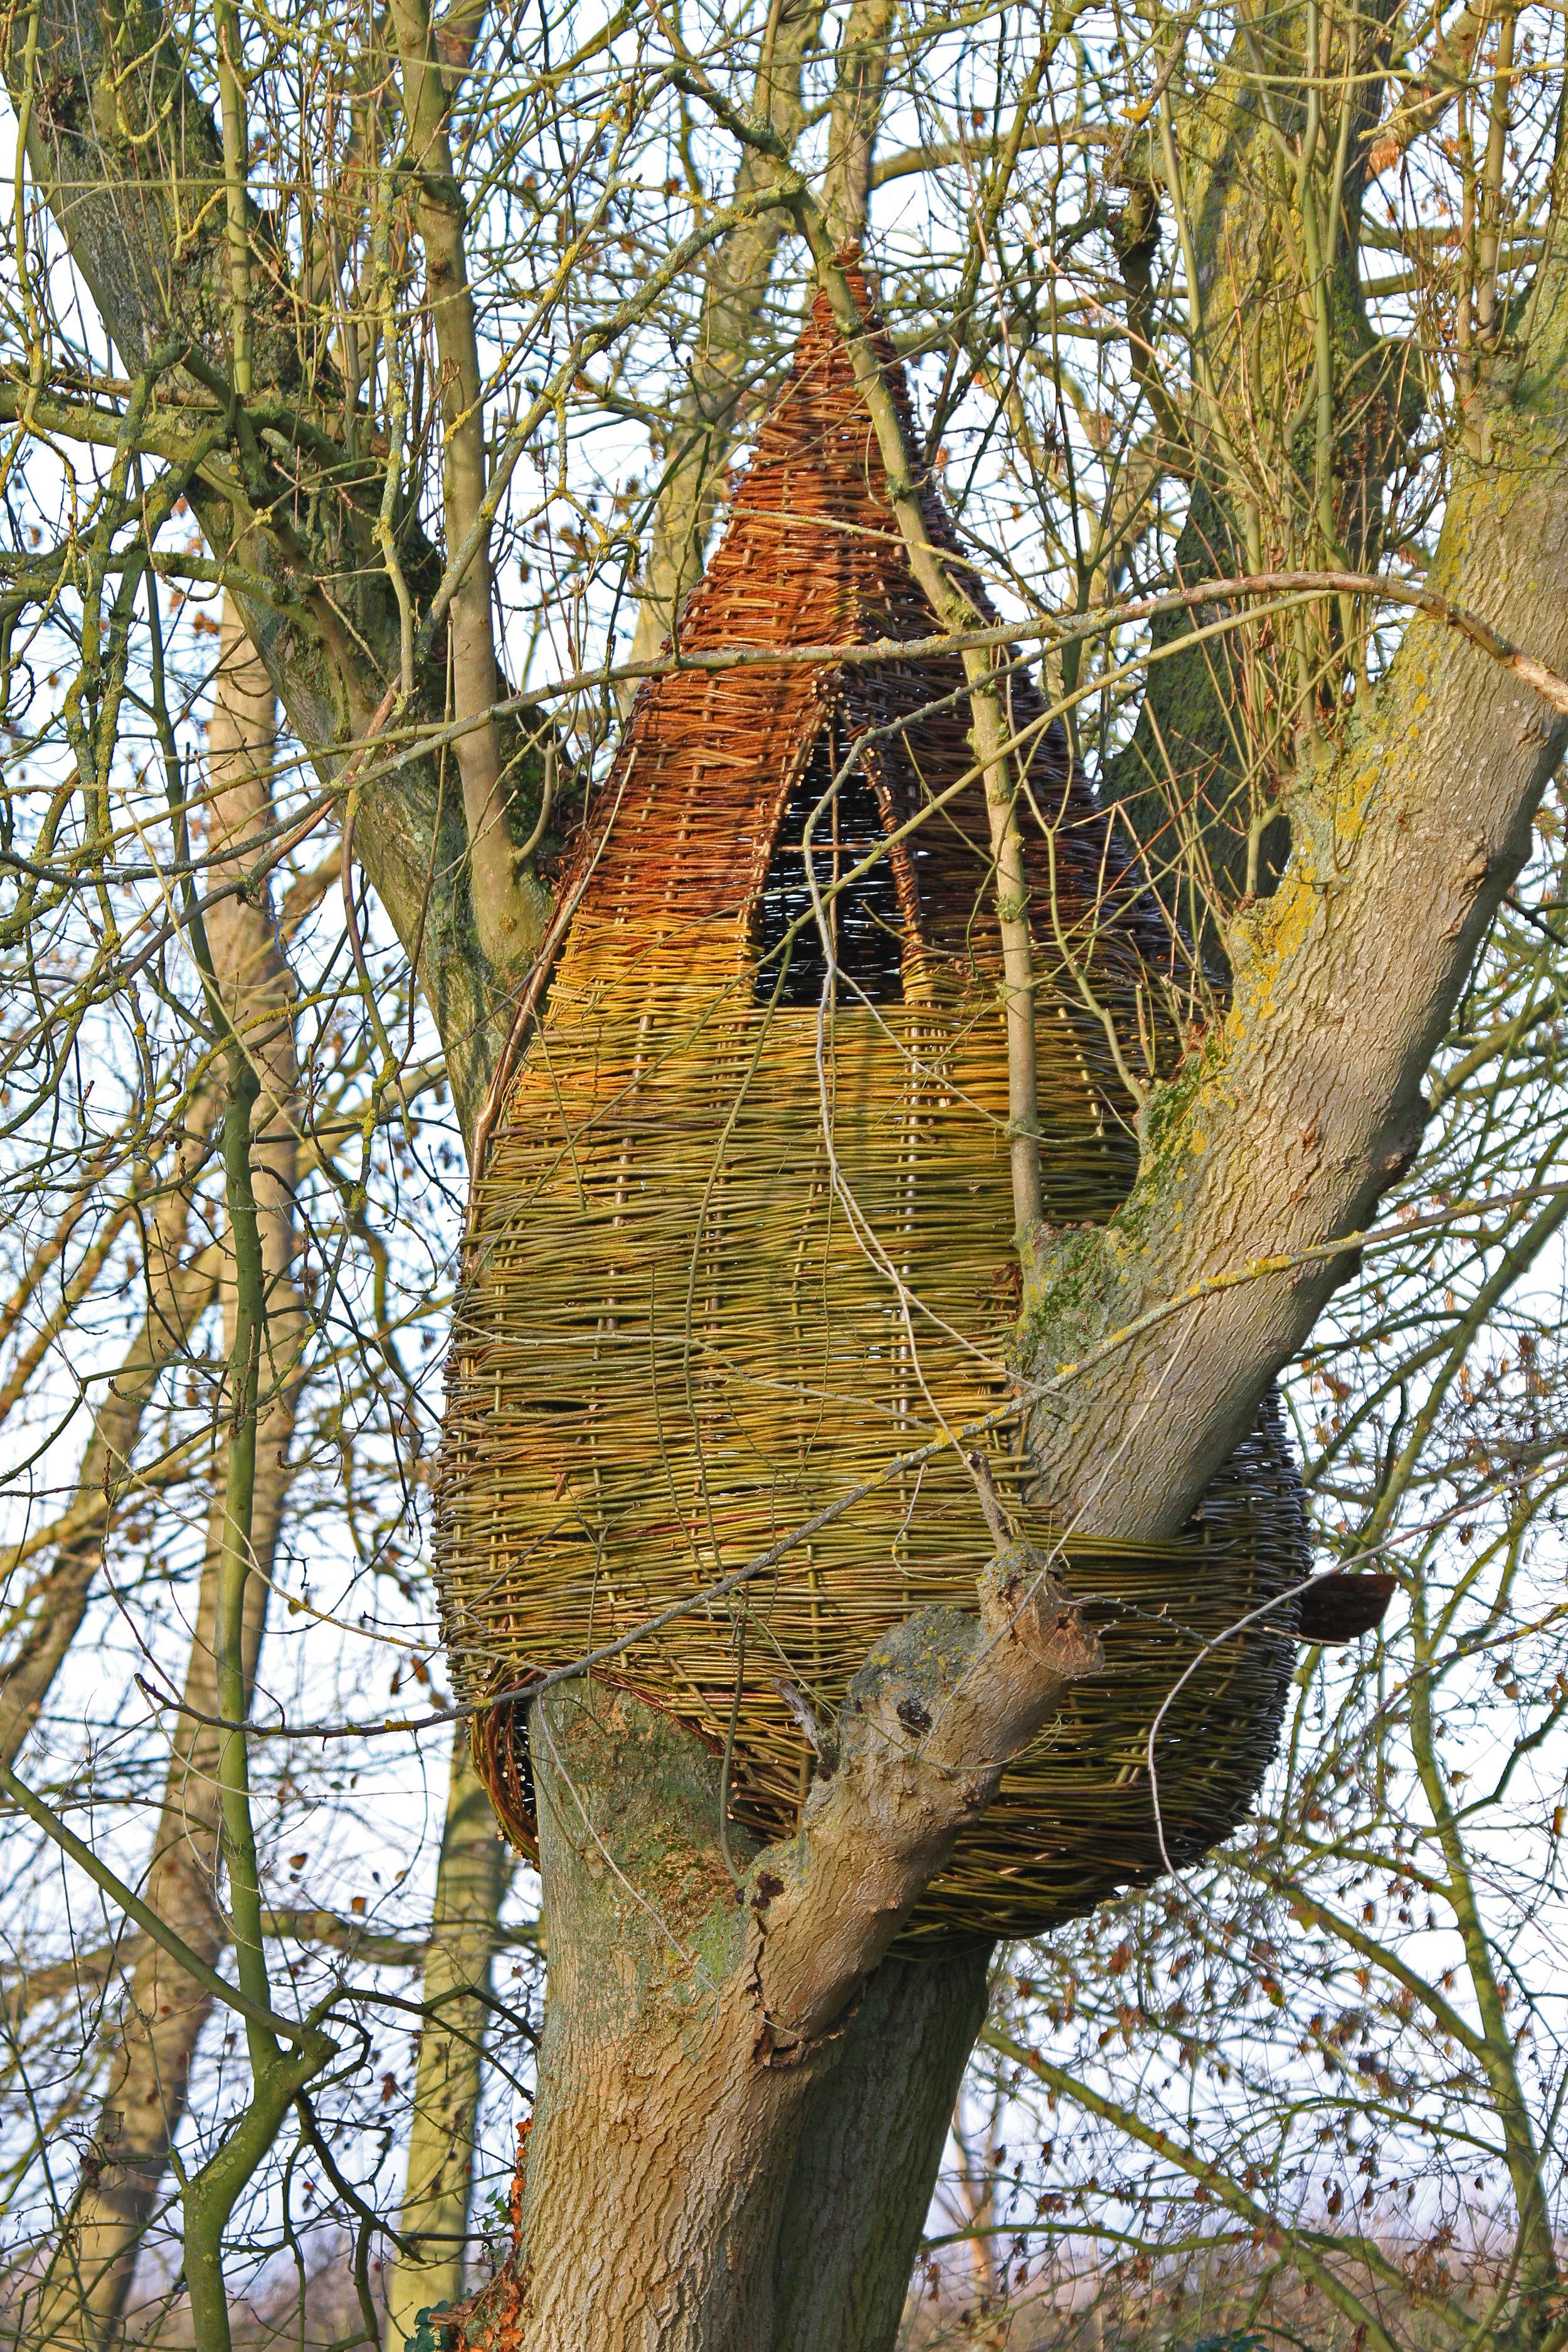 Bespoke tree houses and dens by WonderWood